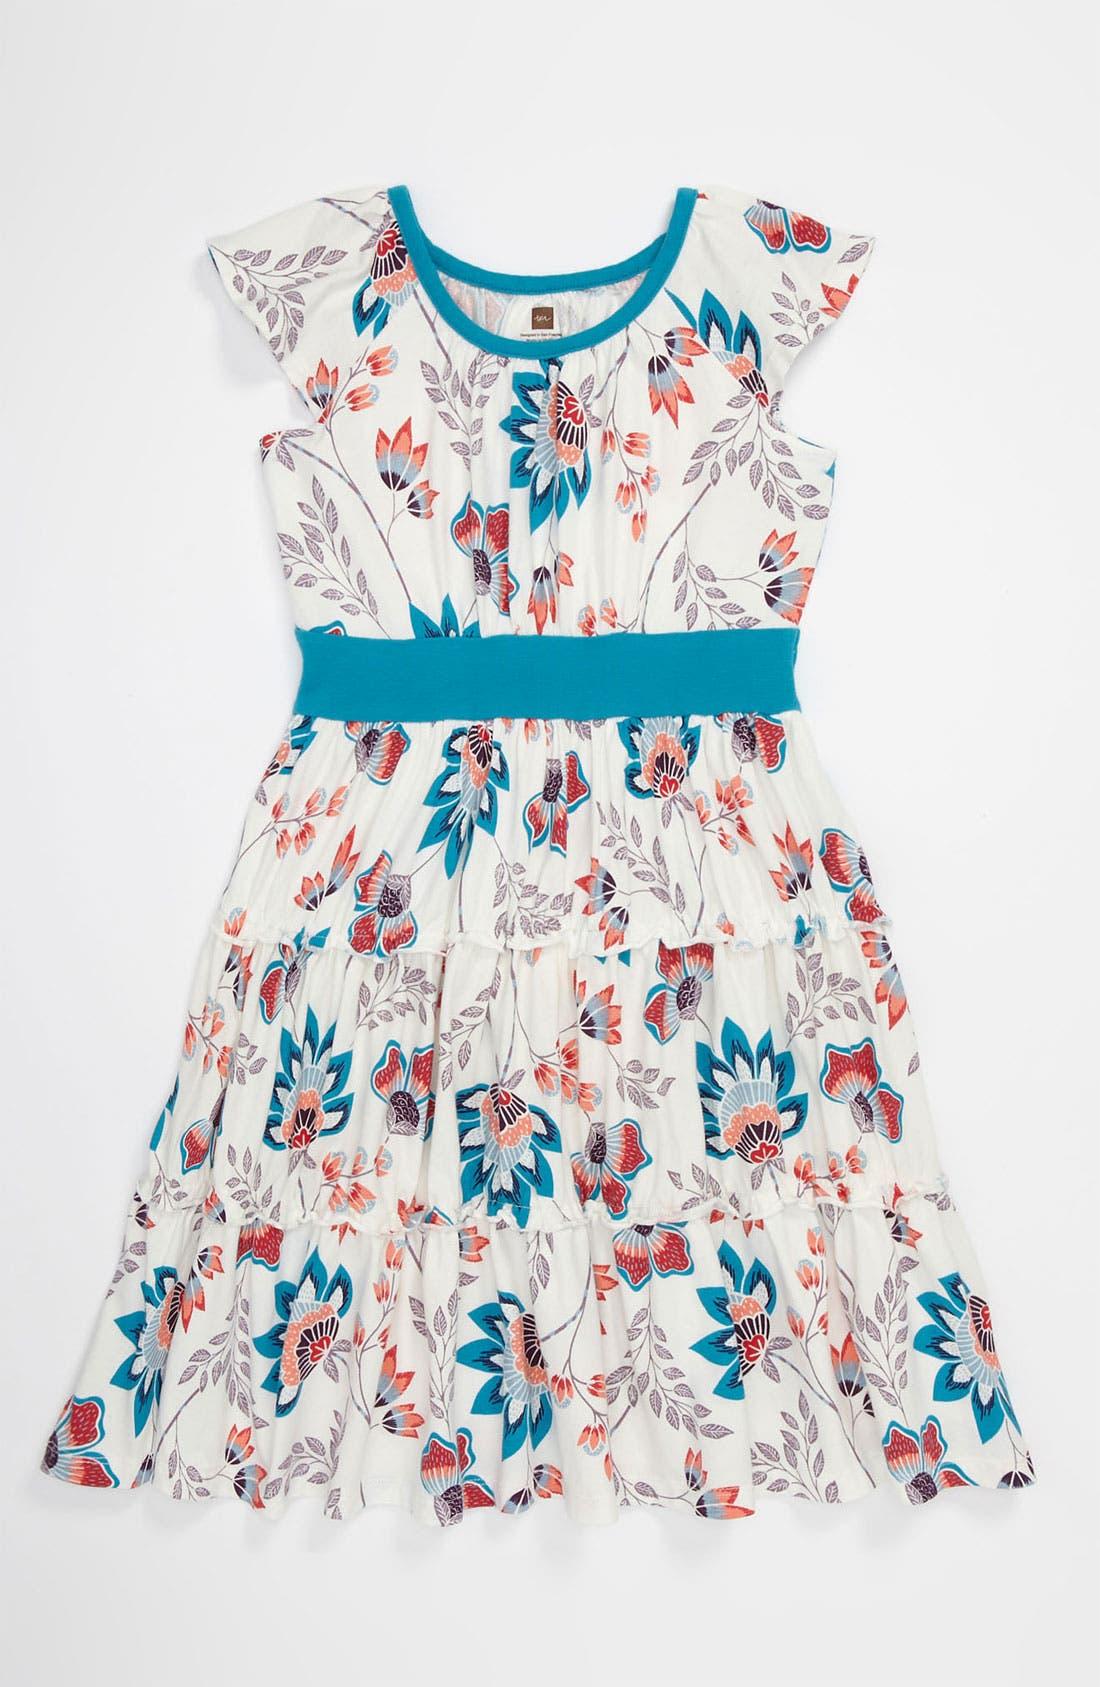 Alternate Image 1 Selected - Tea Collection 'Ardmore' Dress (Toddler, Little Girls & Big Girls)